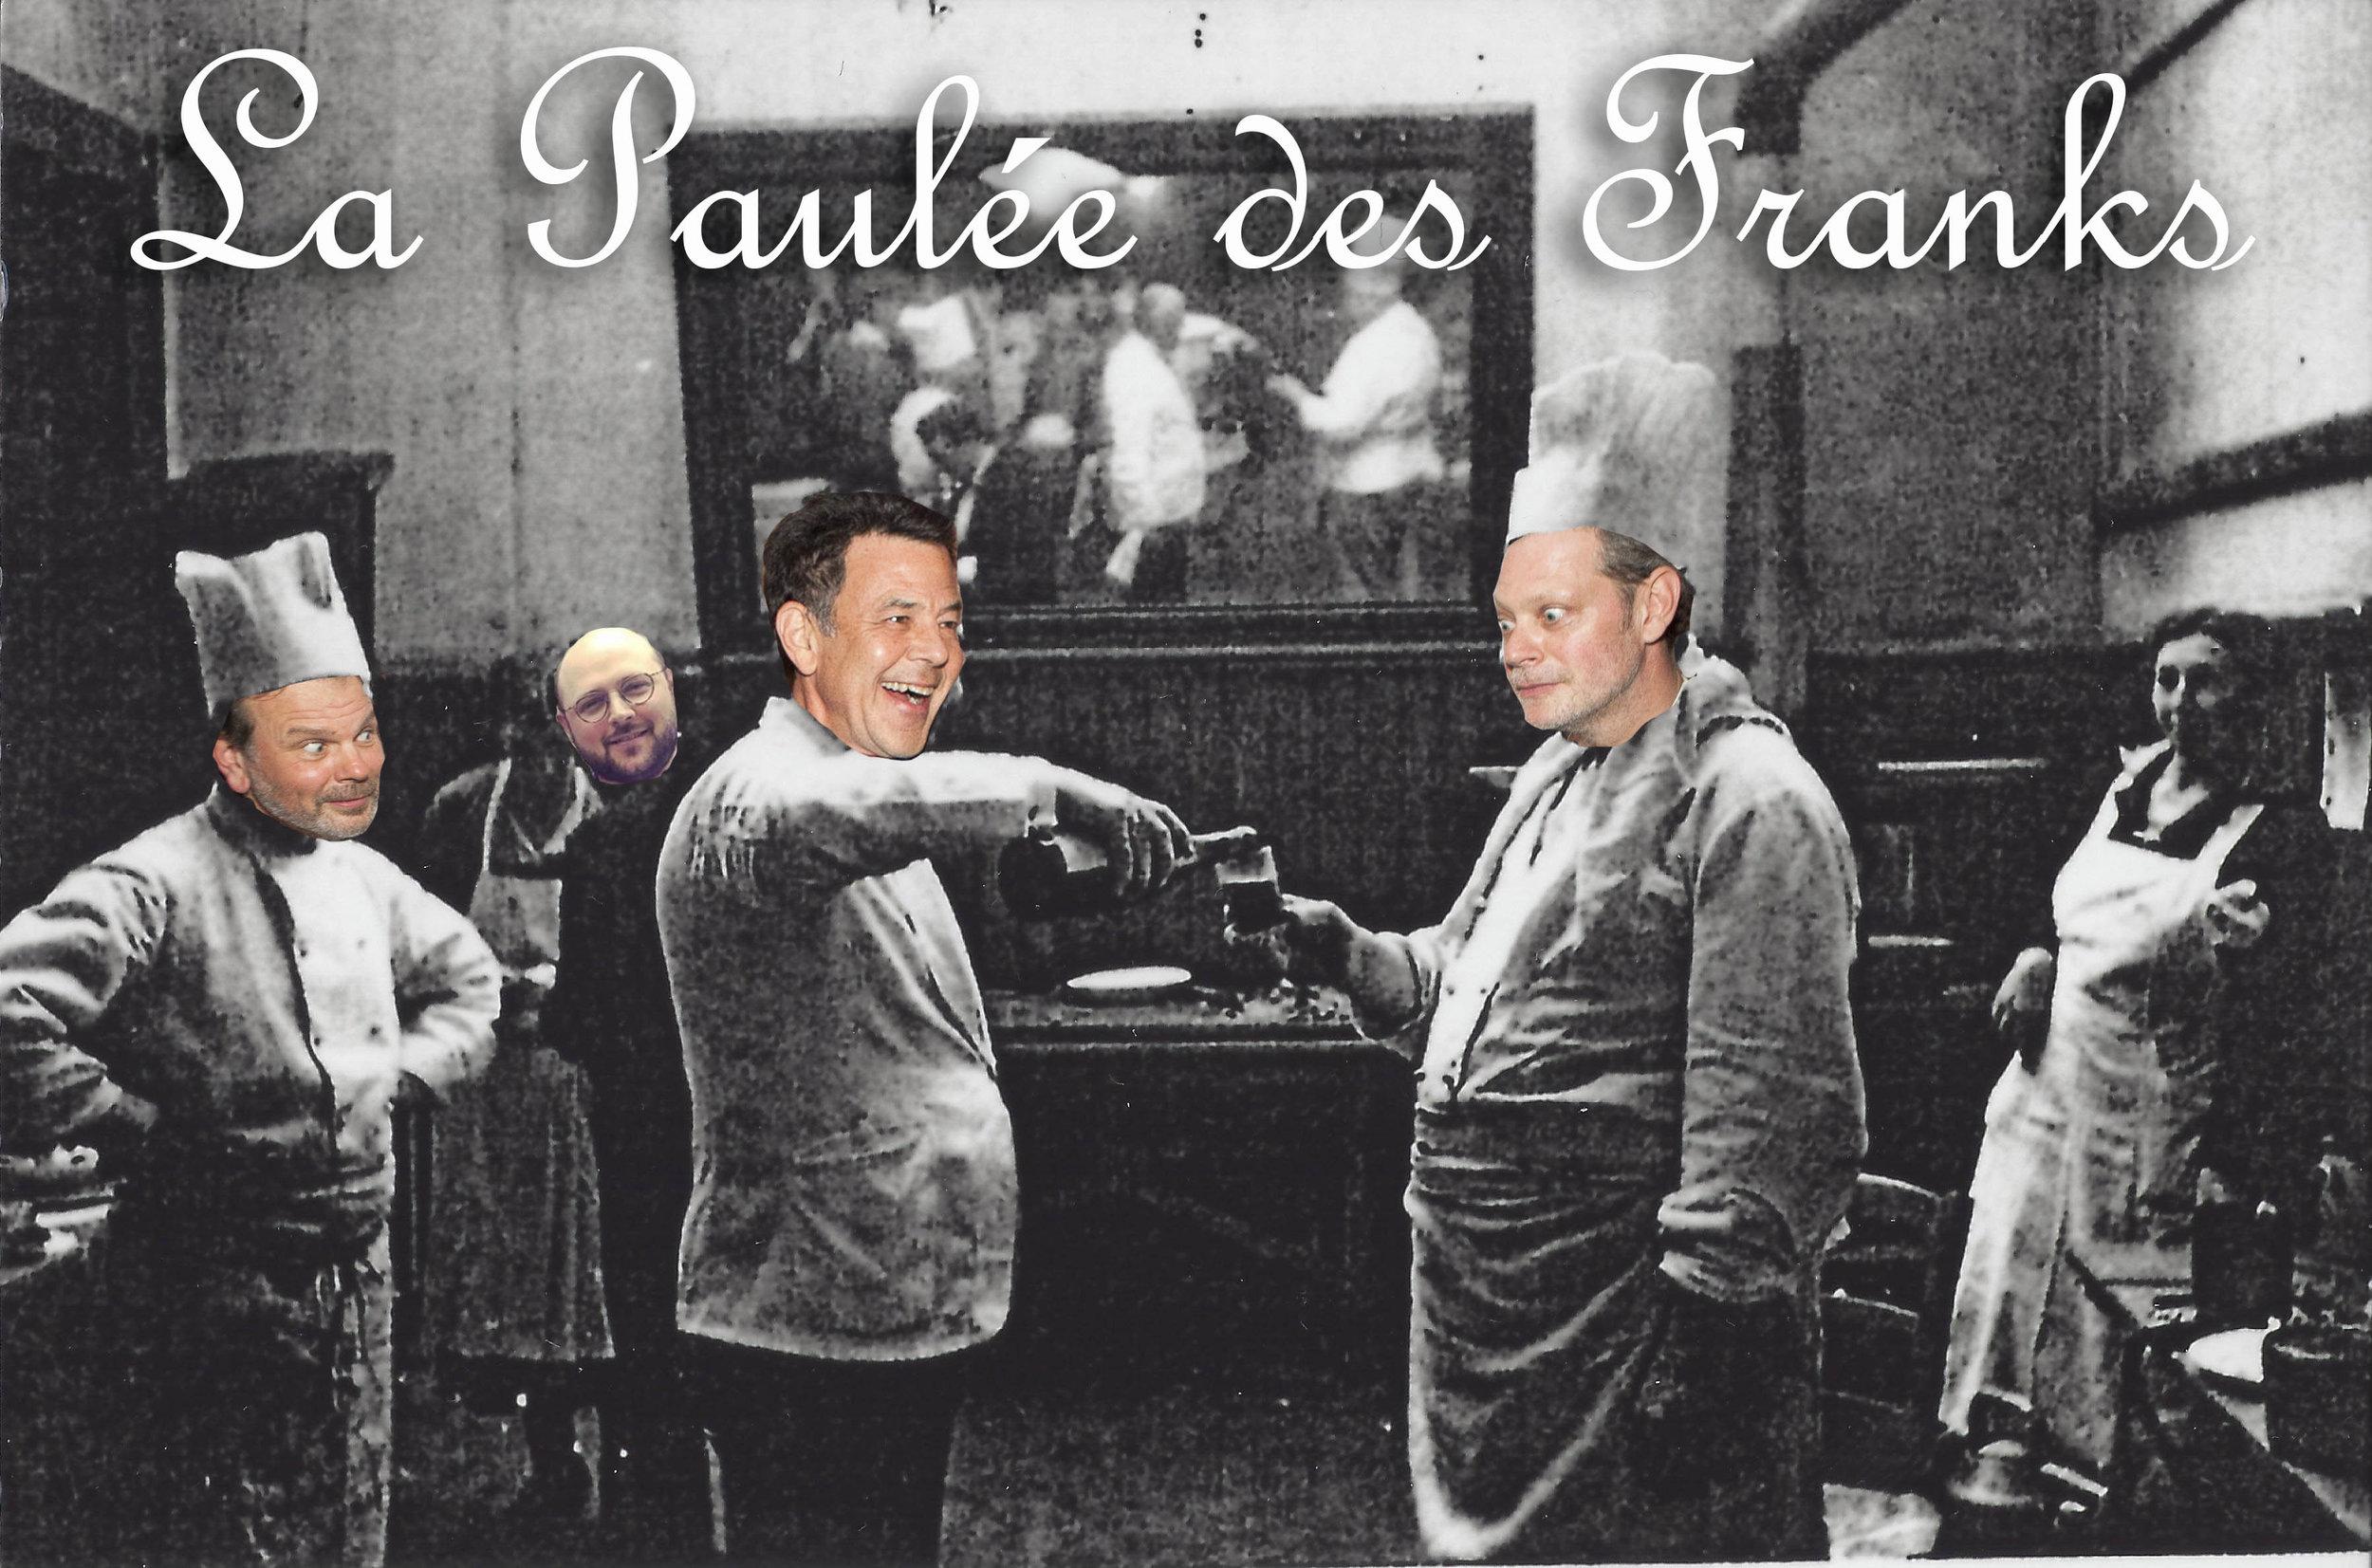 La Paulee des Franks.jpg